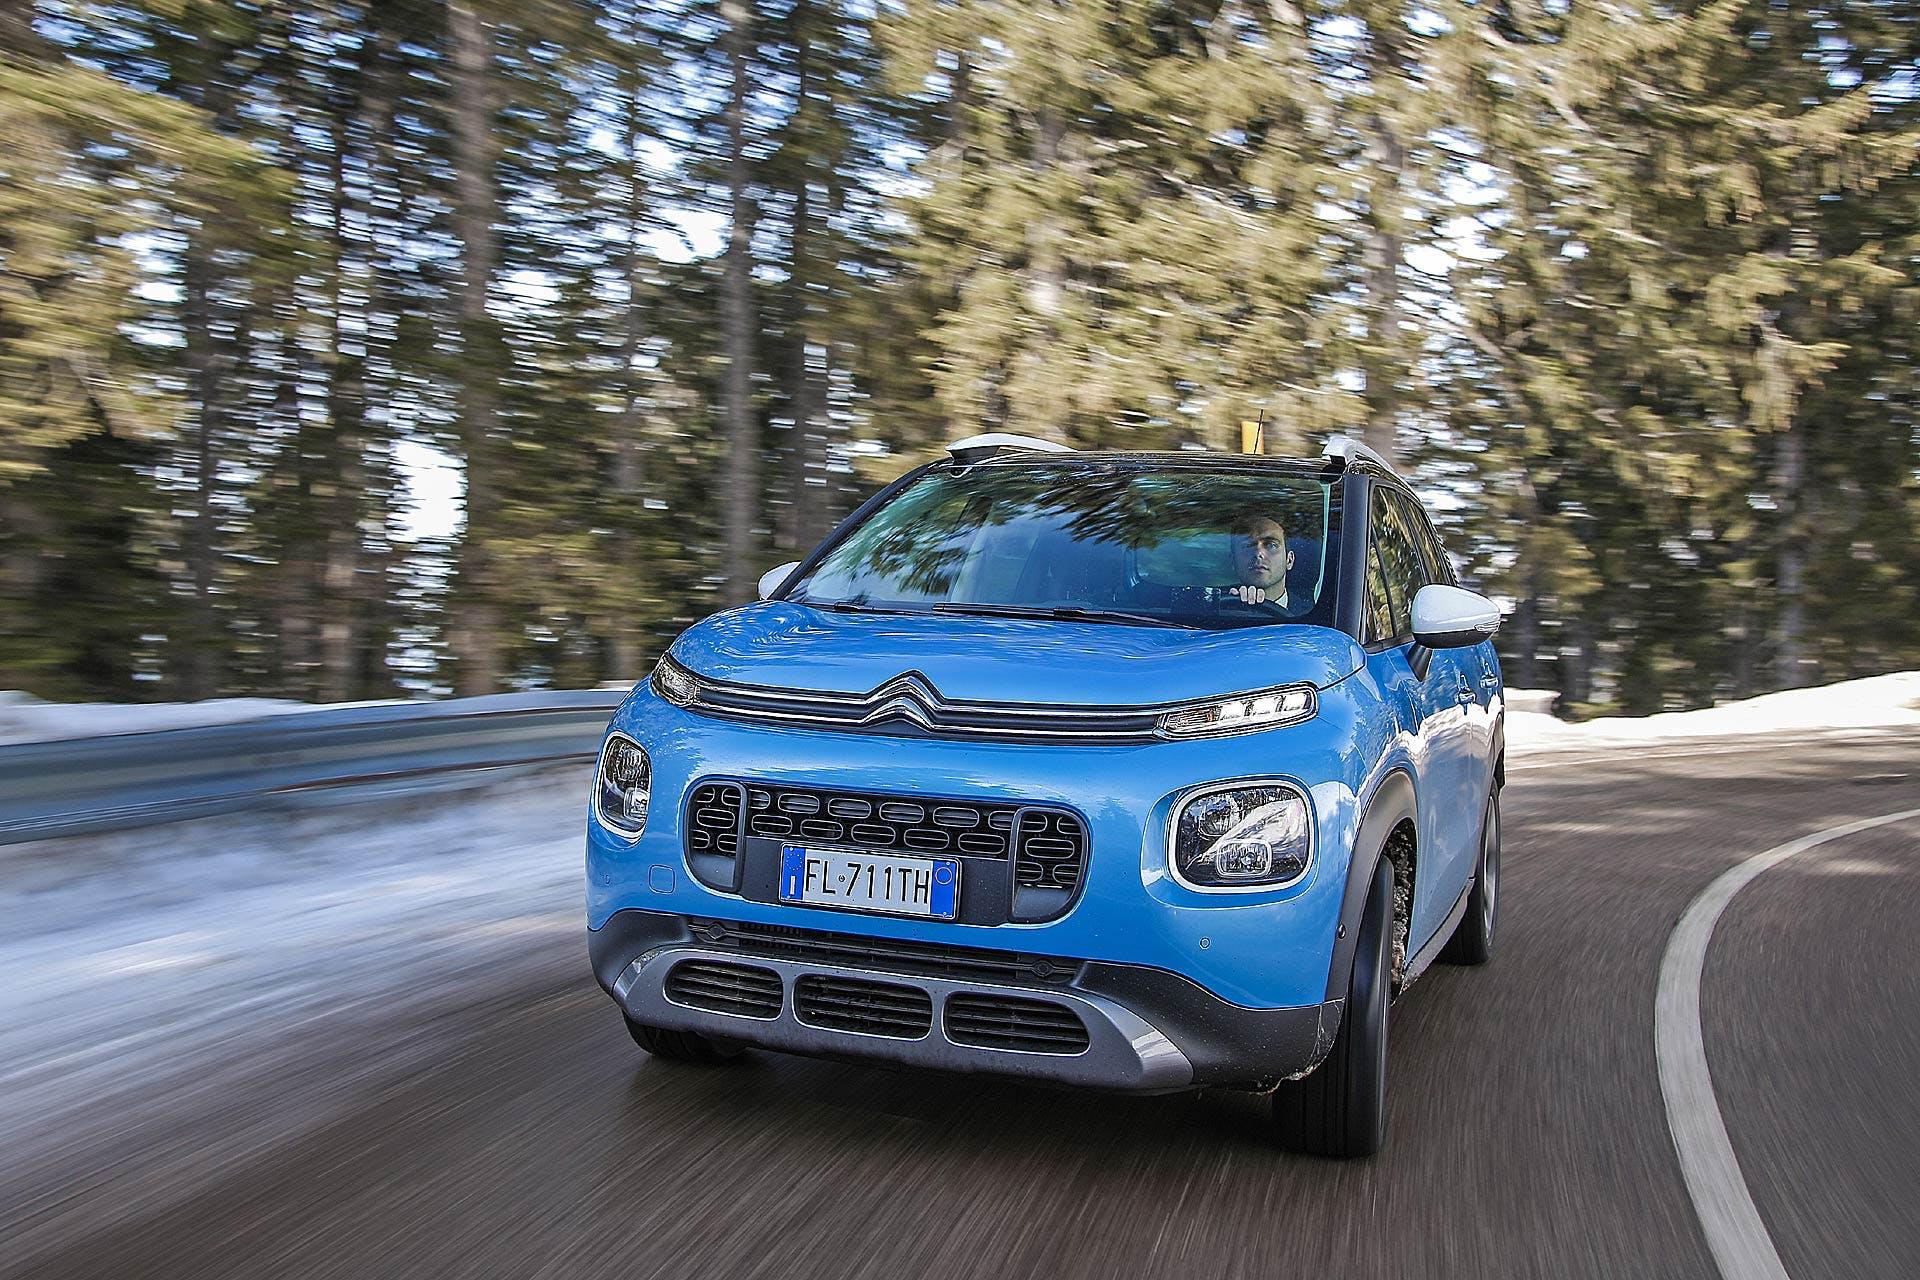 Citroën C3 Aircross azzurra impegnata in curva asfaltata di montagna tra pini e neve